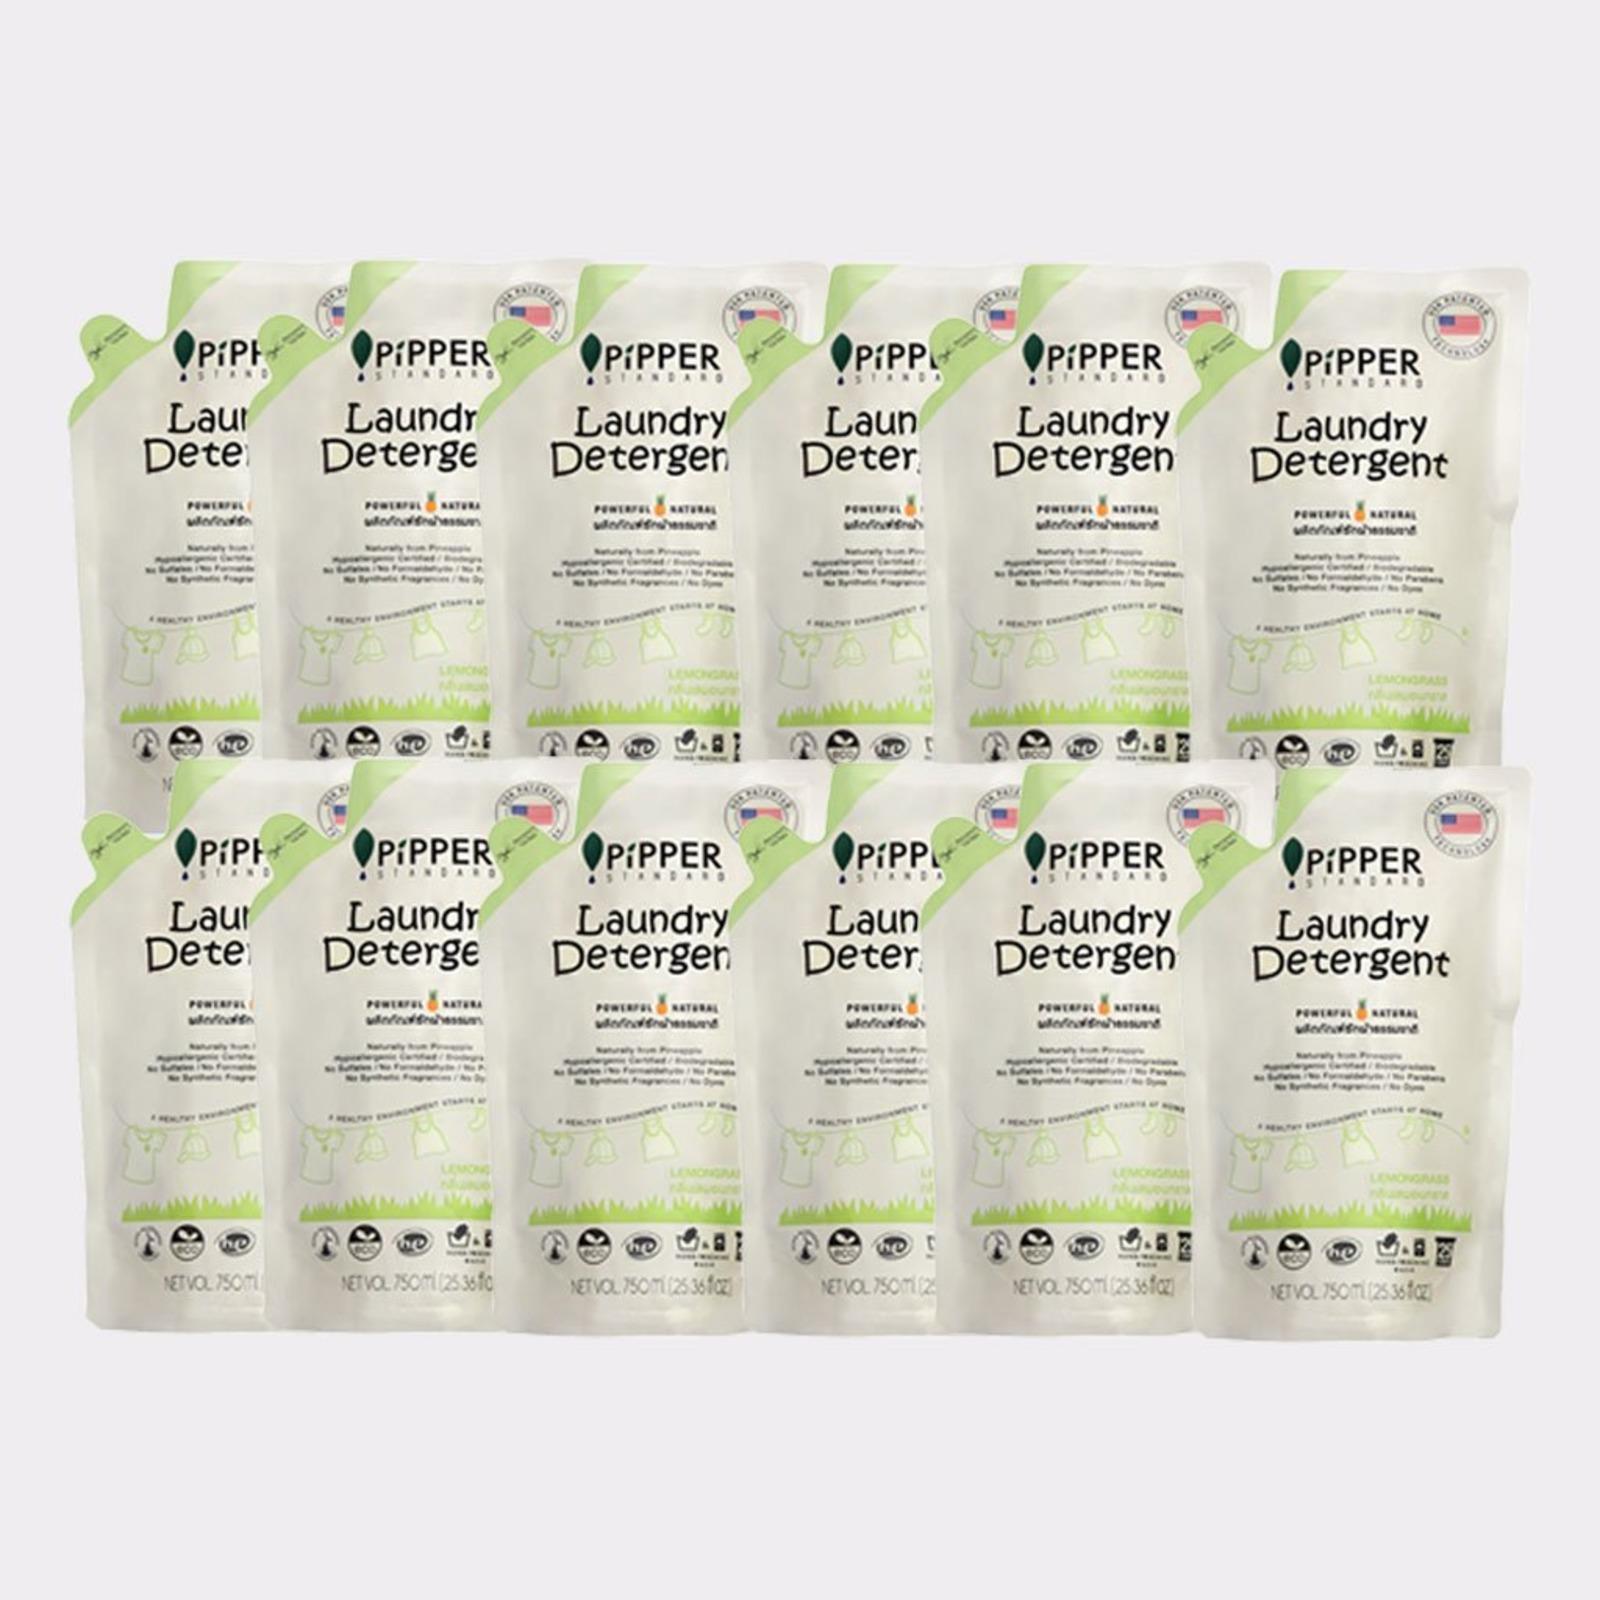 PiPPER Standard Laundry Detergent Lemongrass Refill